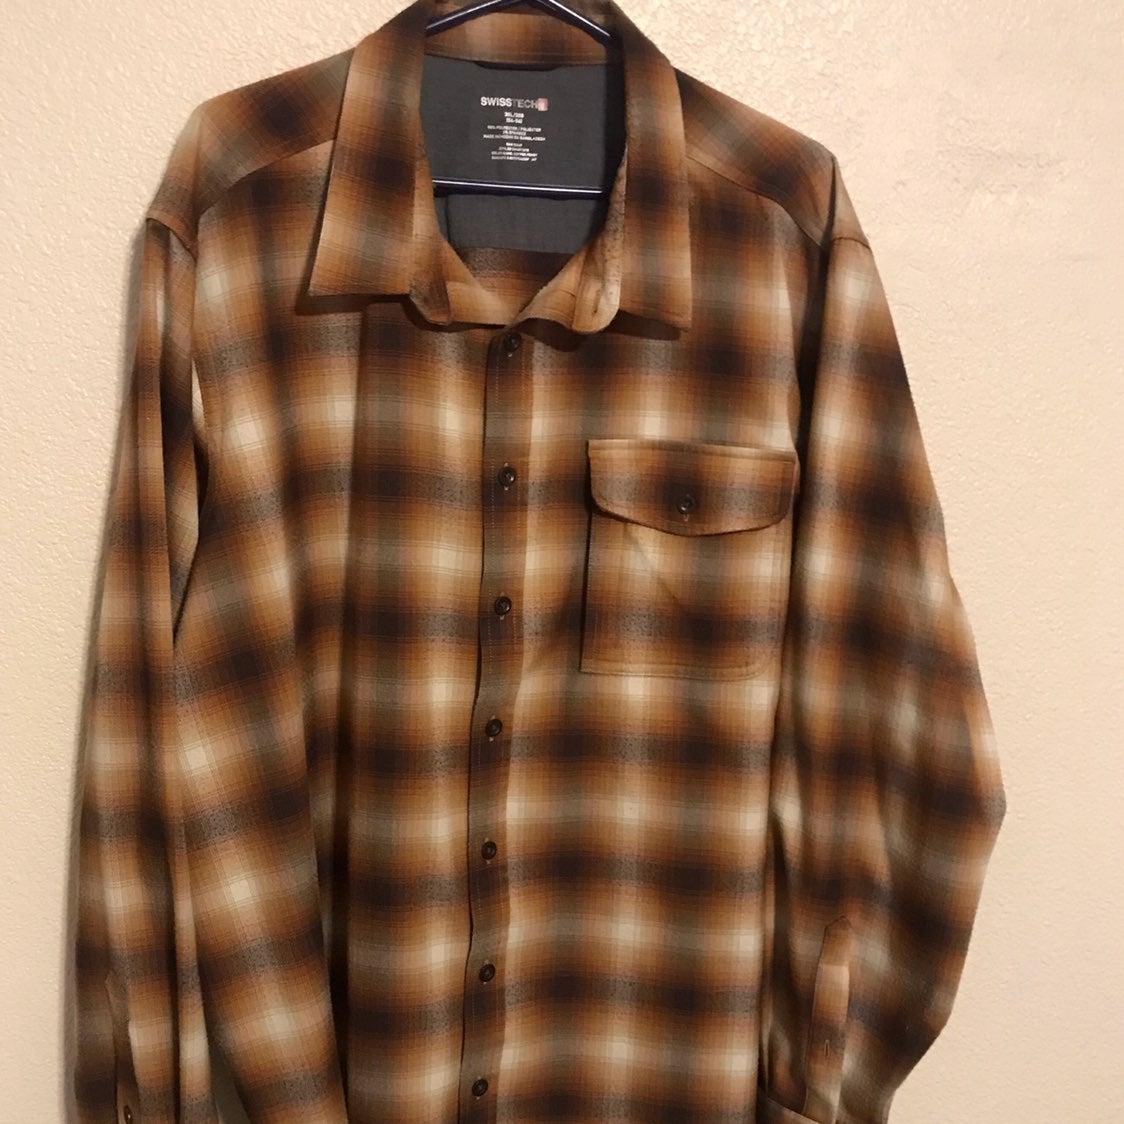 Mens 3x flannel, long sleeve